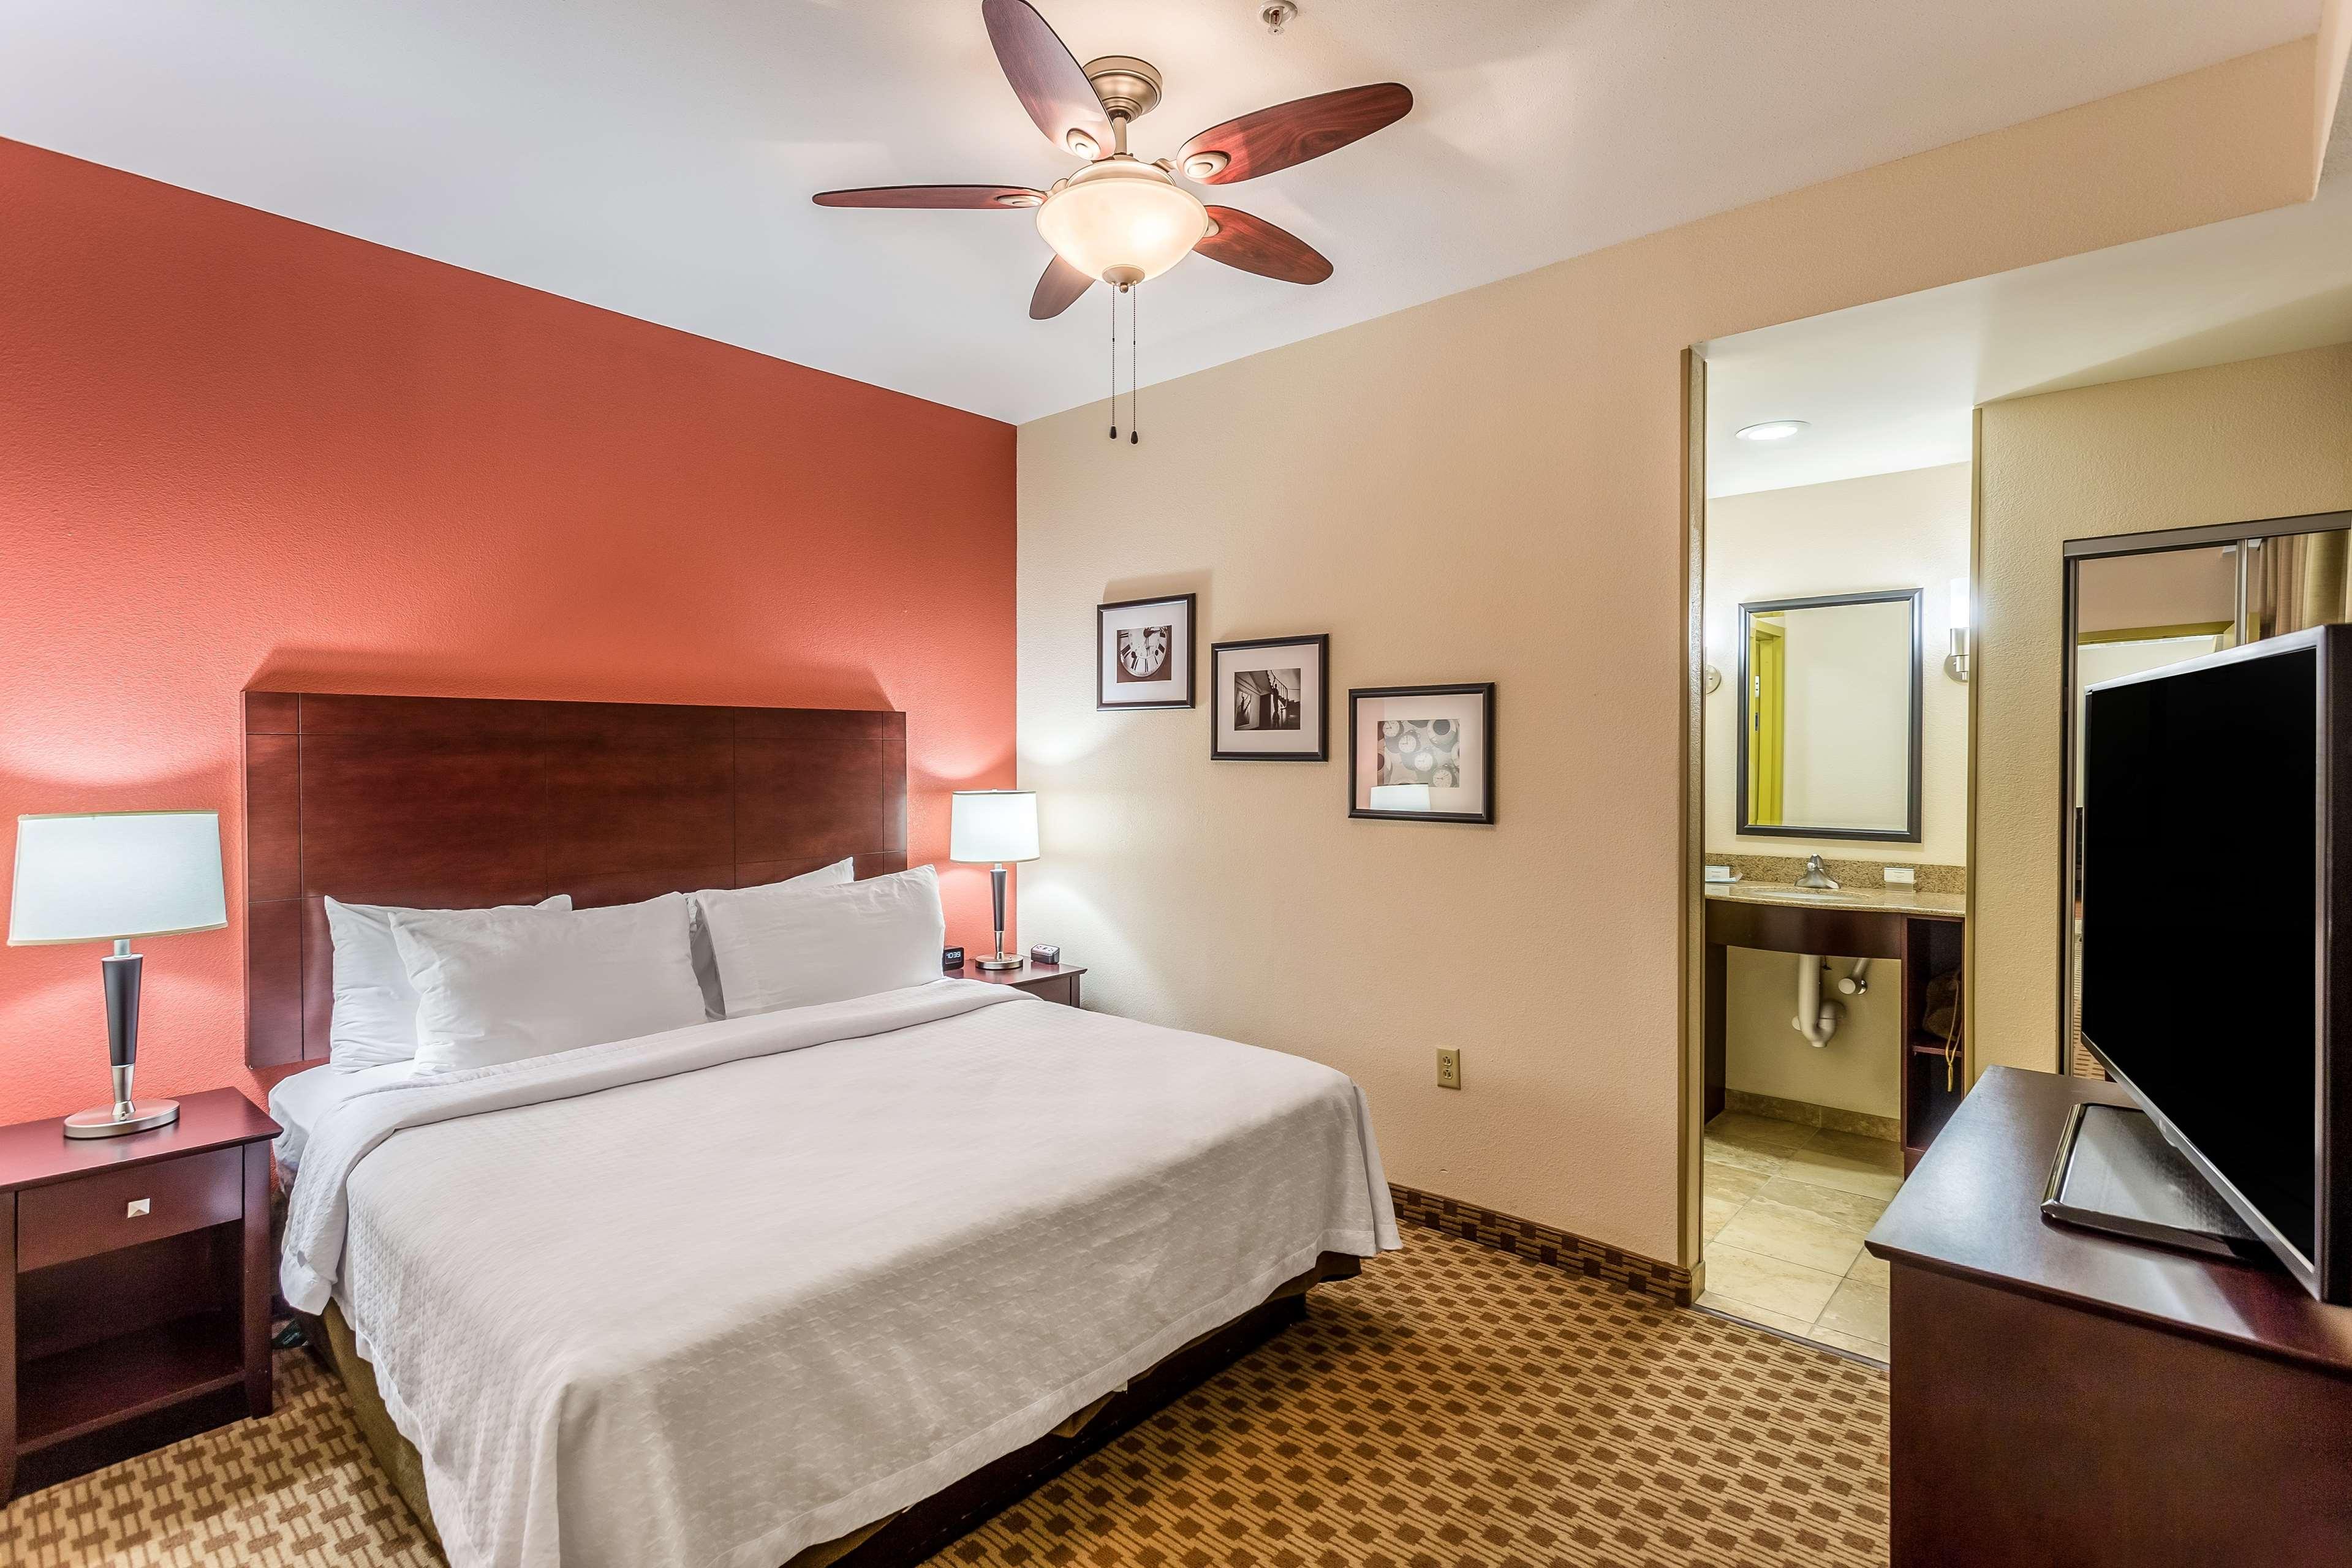 Homewood Suites by Hilton Nashville-Downtown image 16